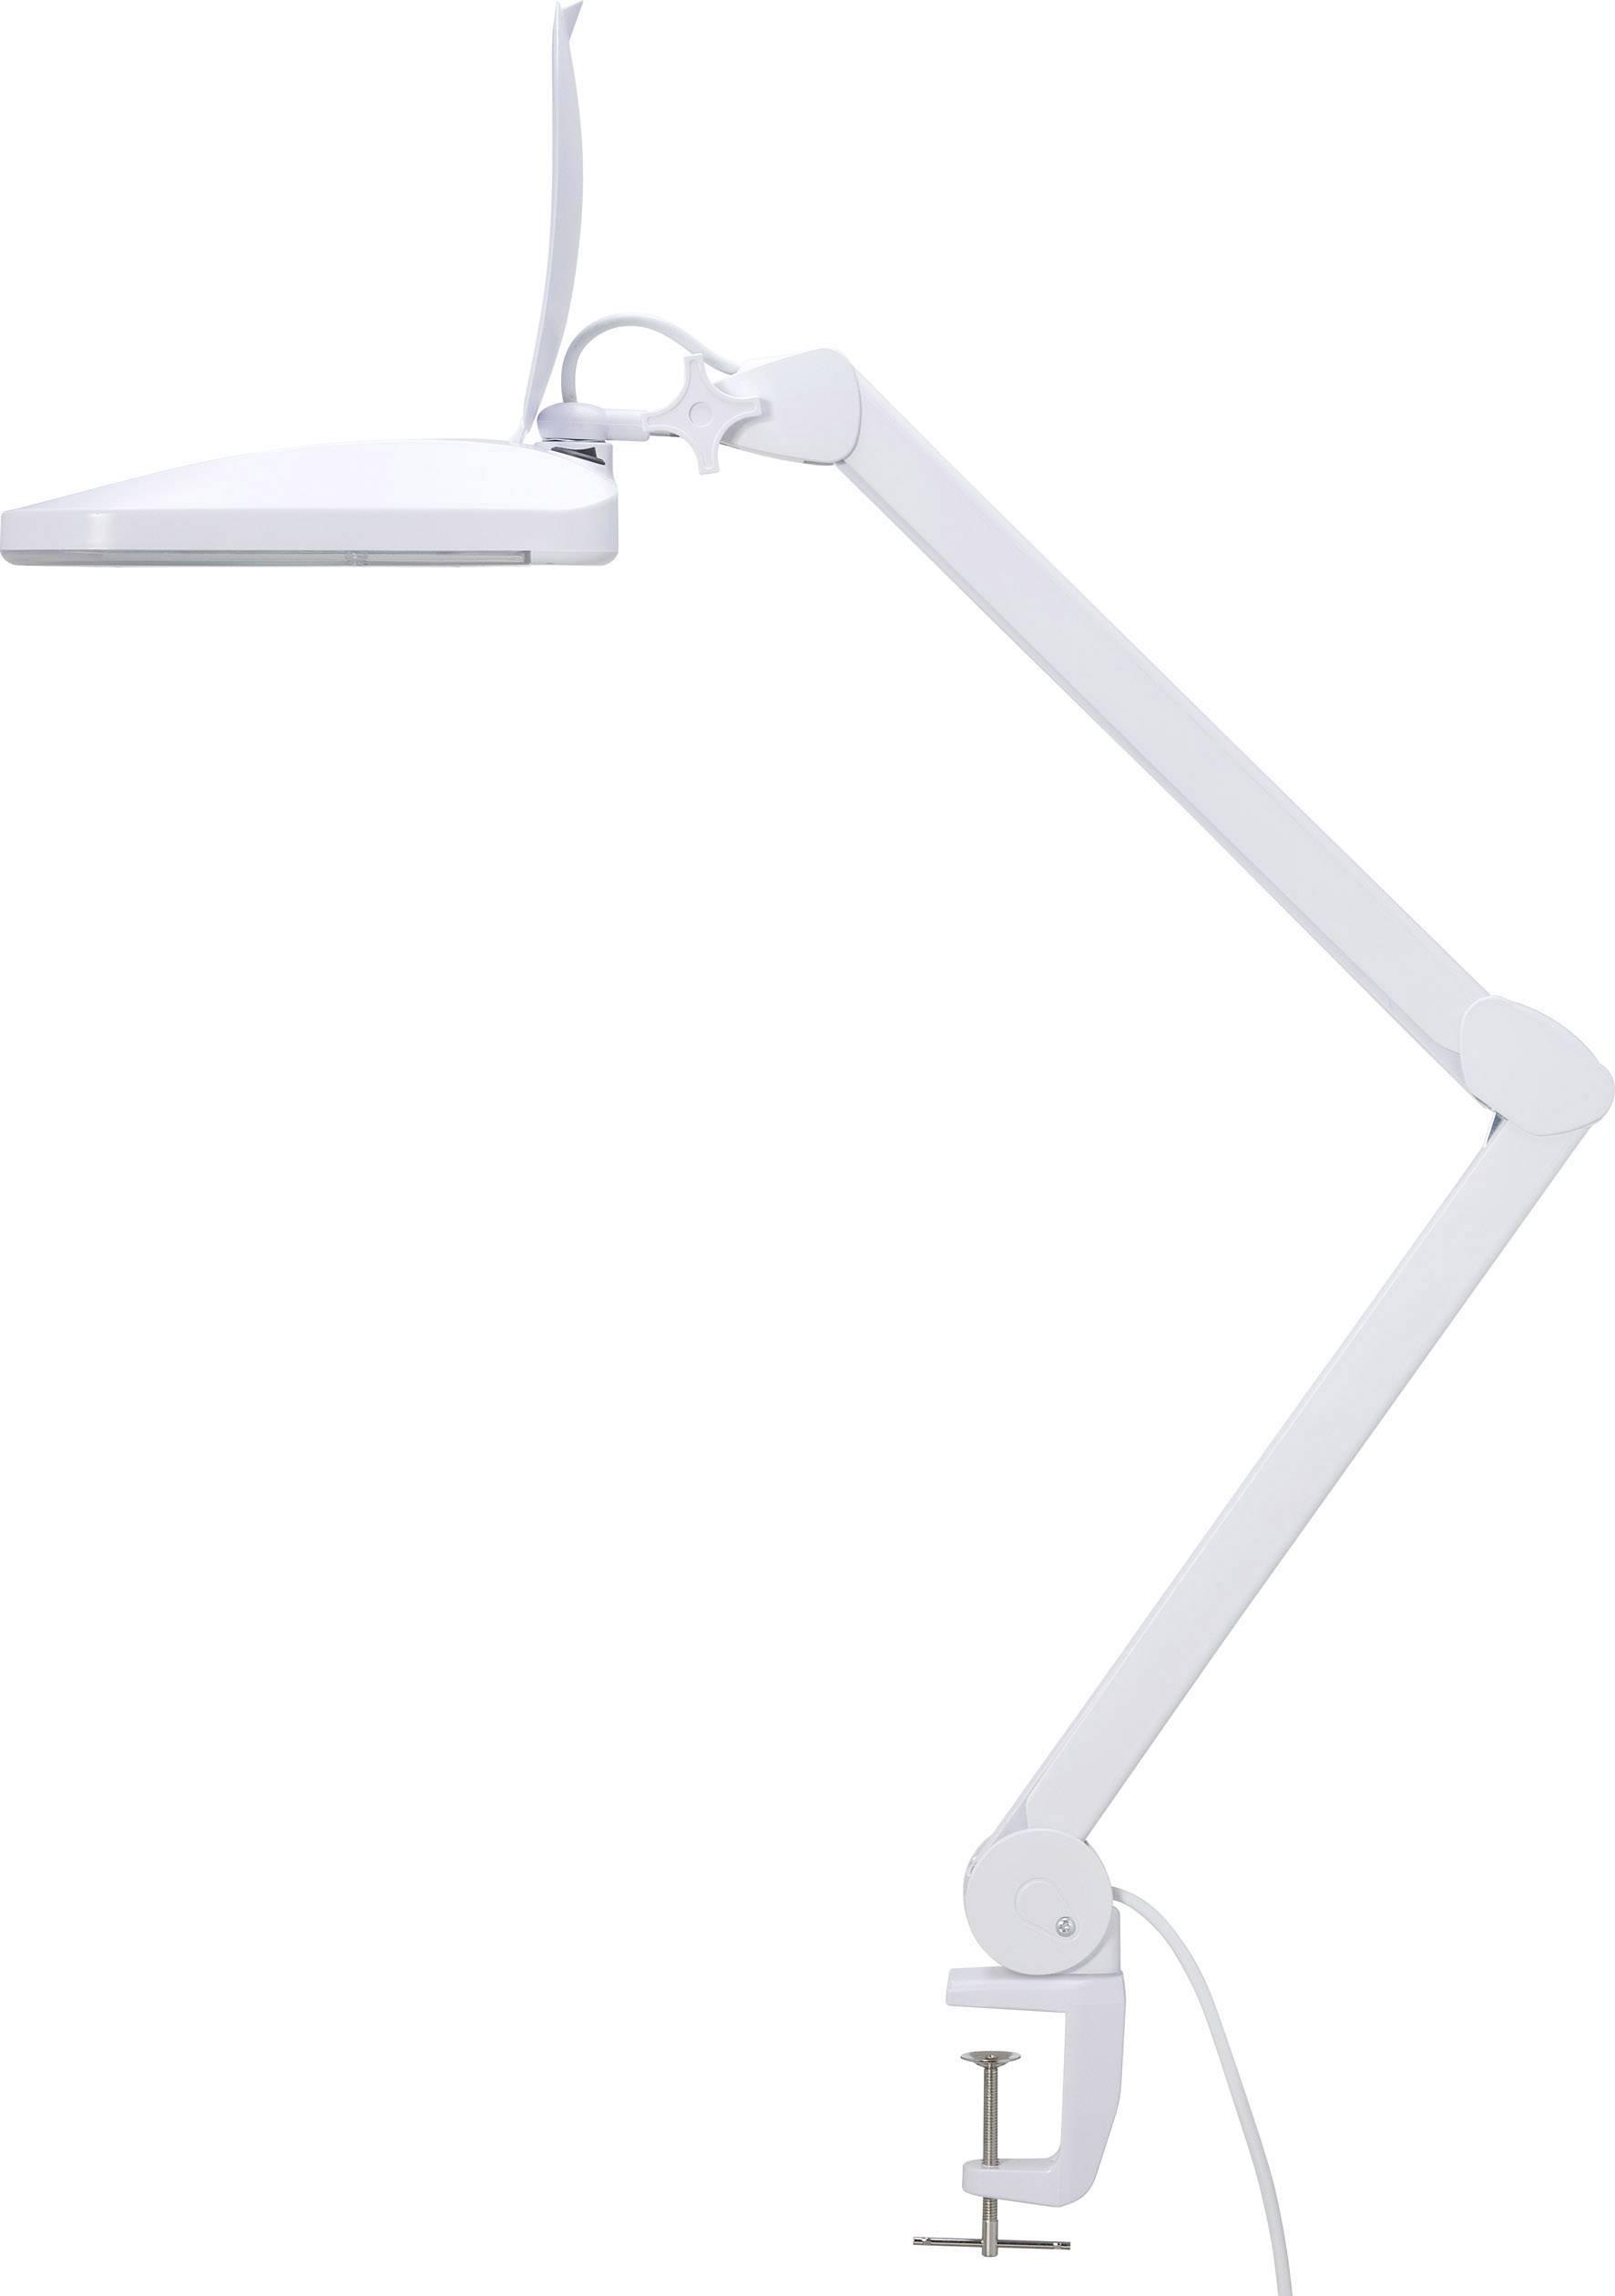 Stolná lupa s LED osvetlením TOOLCRAFT prac.rádius 270 mm